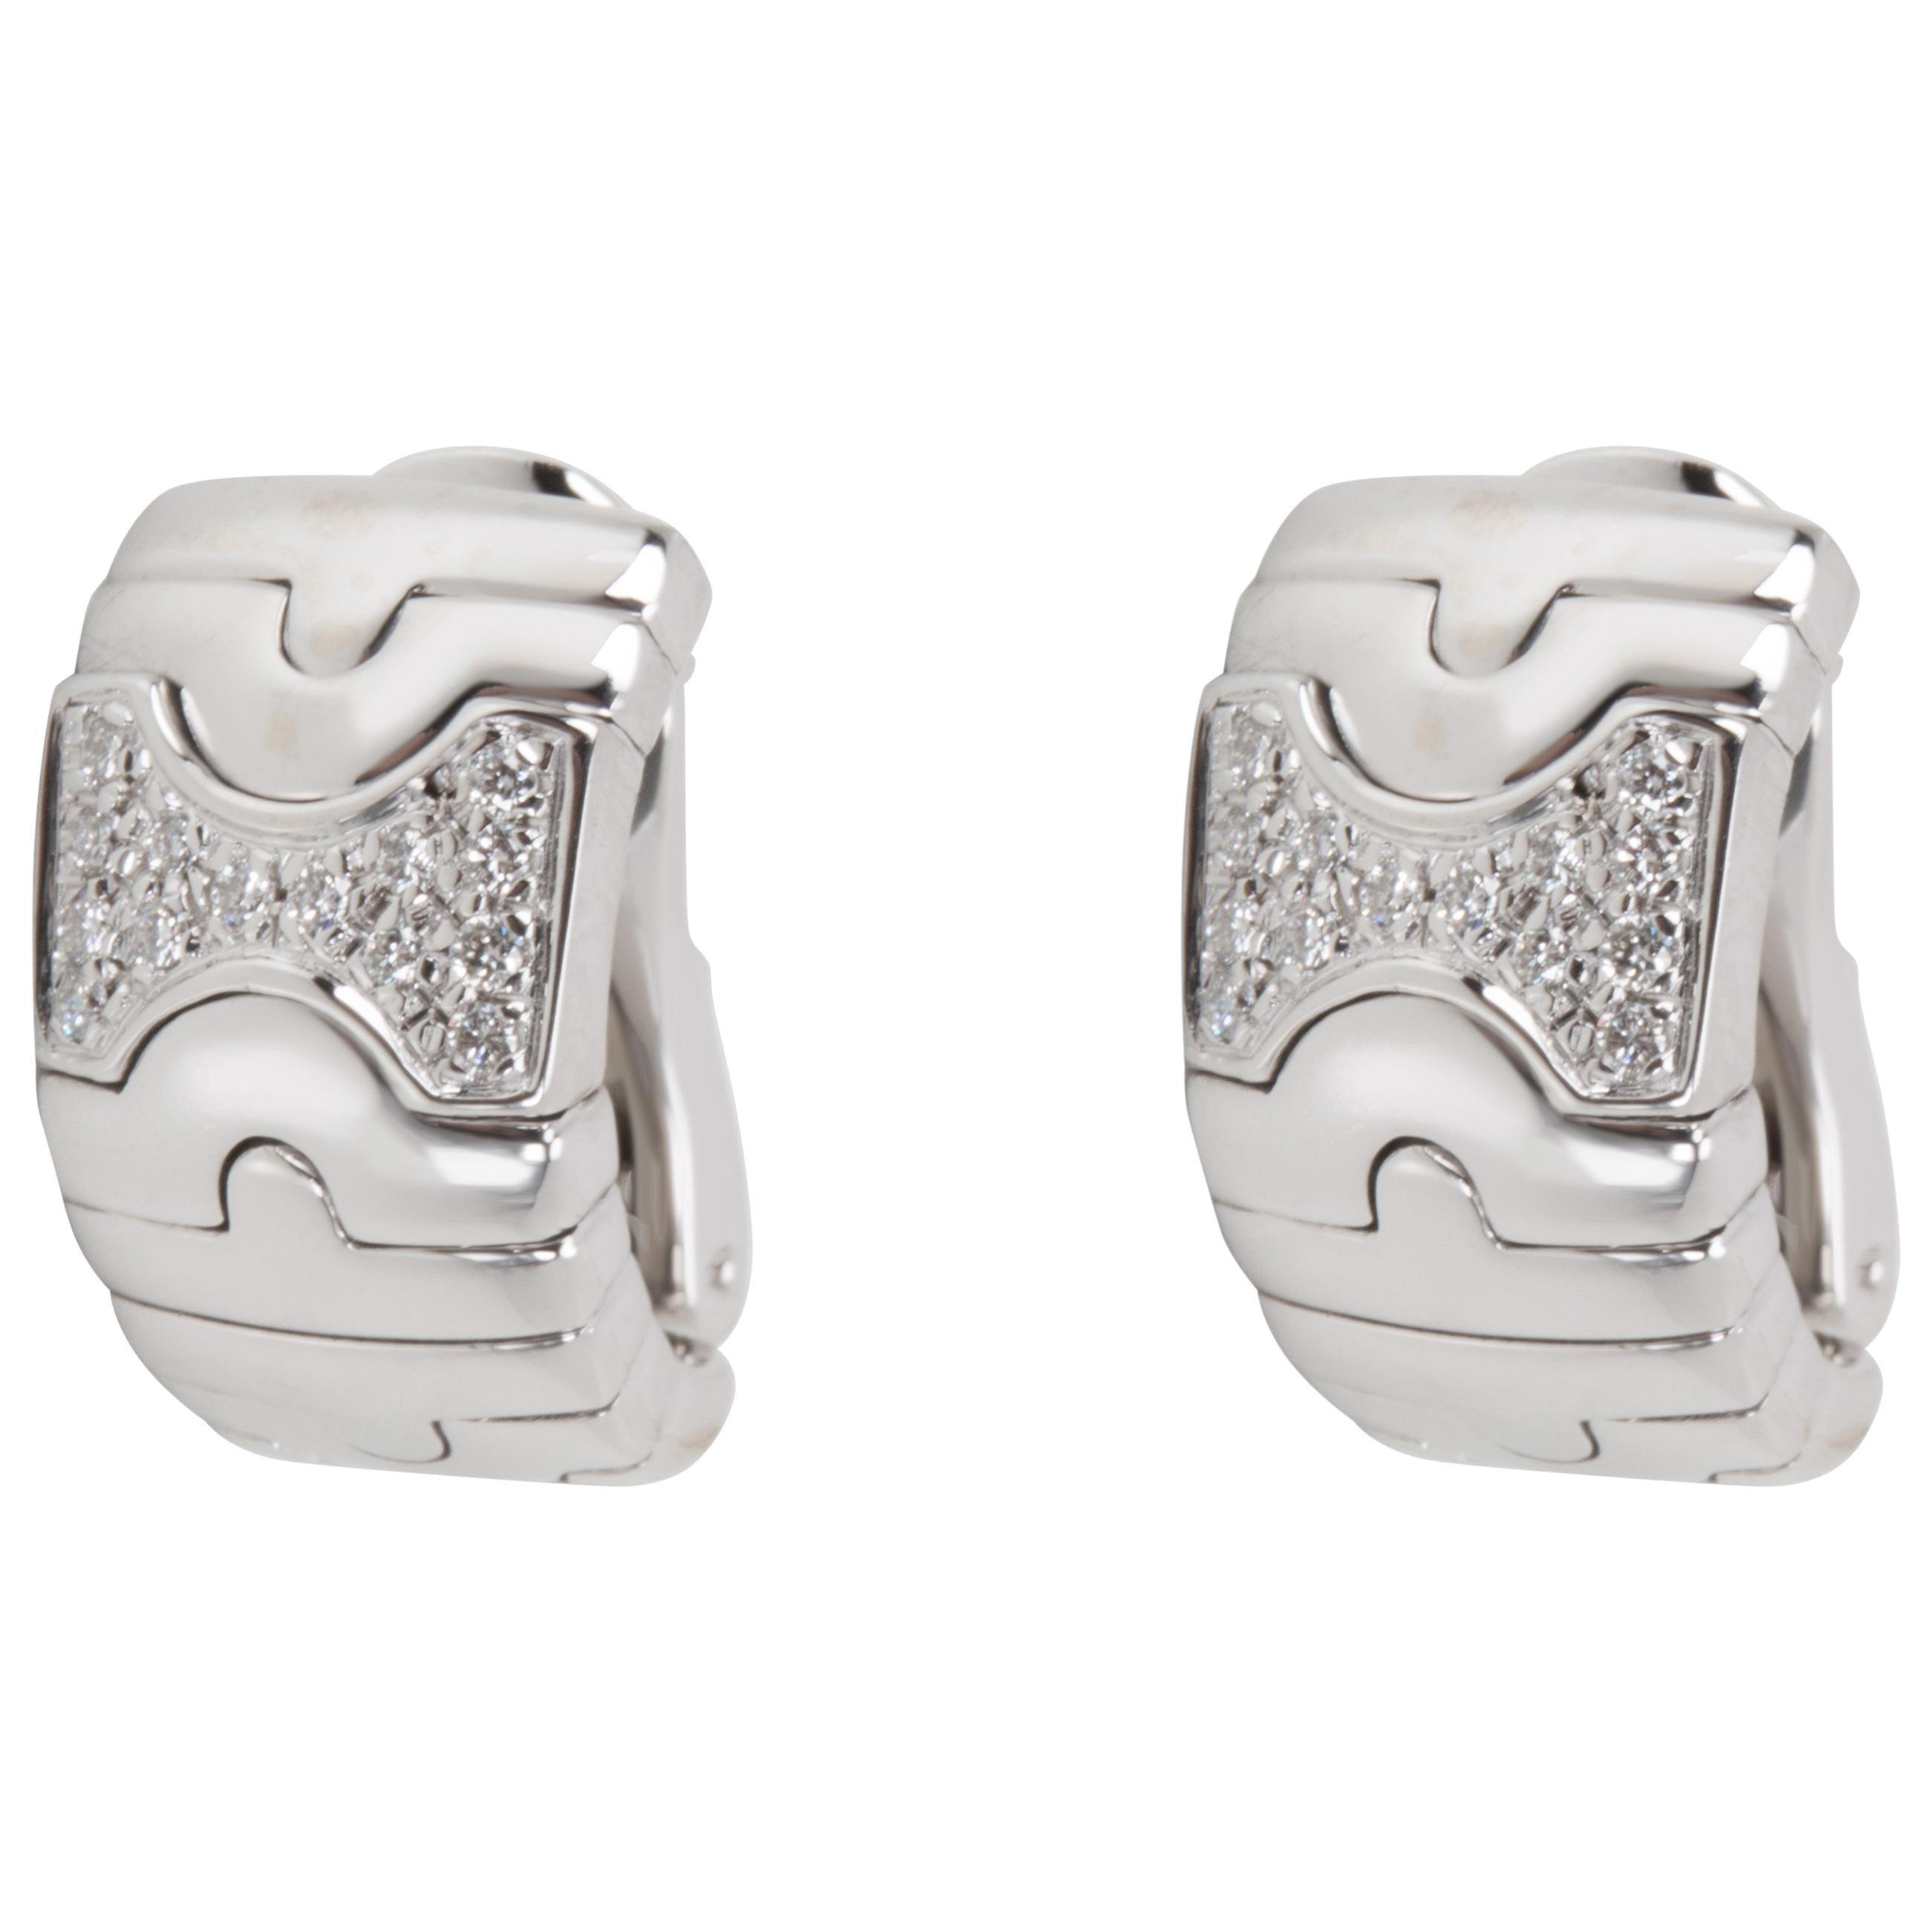 Bulgari Parentesi Diamond Earrings in 18 Karat White Gold 0.5 Carat